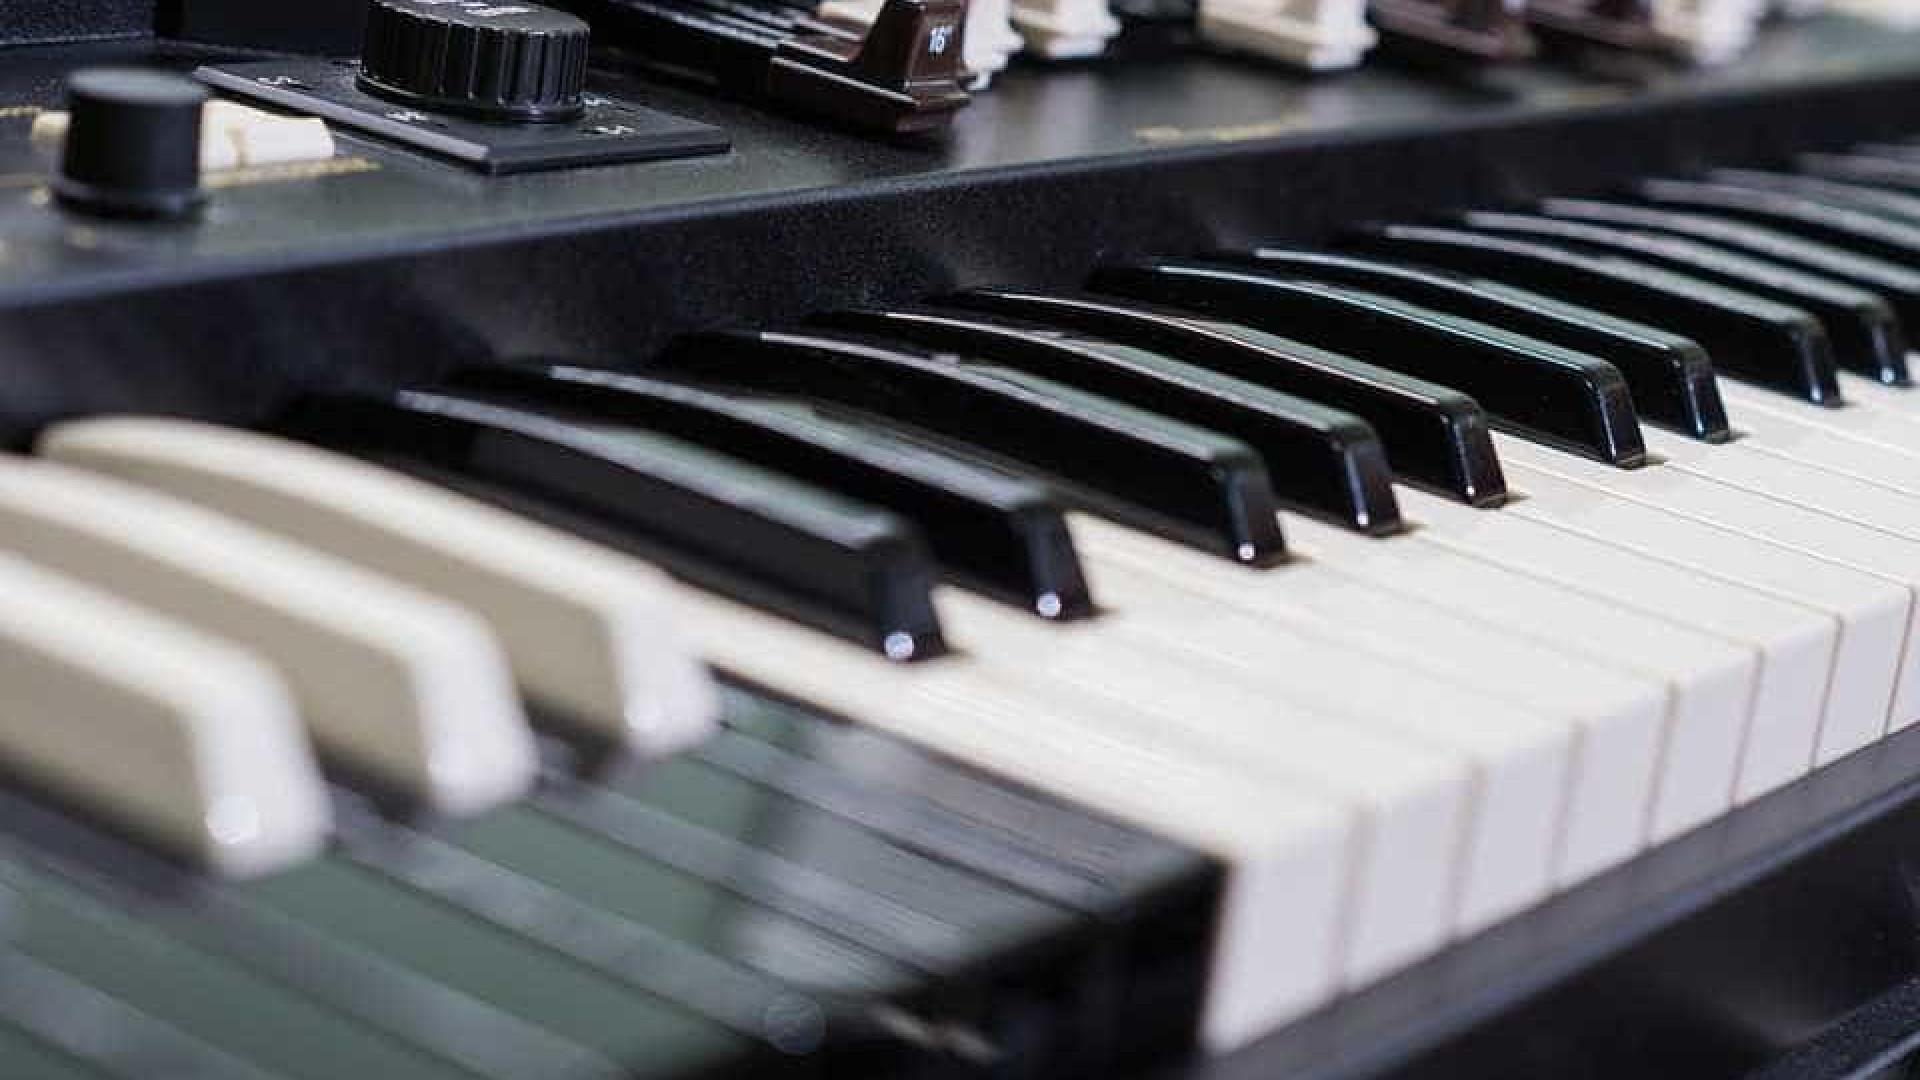 Pianista Menahem Pressler regressa sexta-feira à Gulbenkian